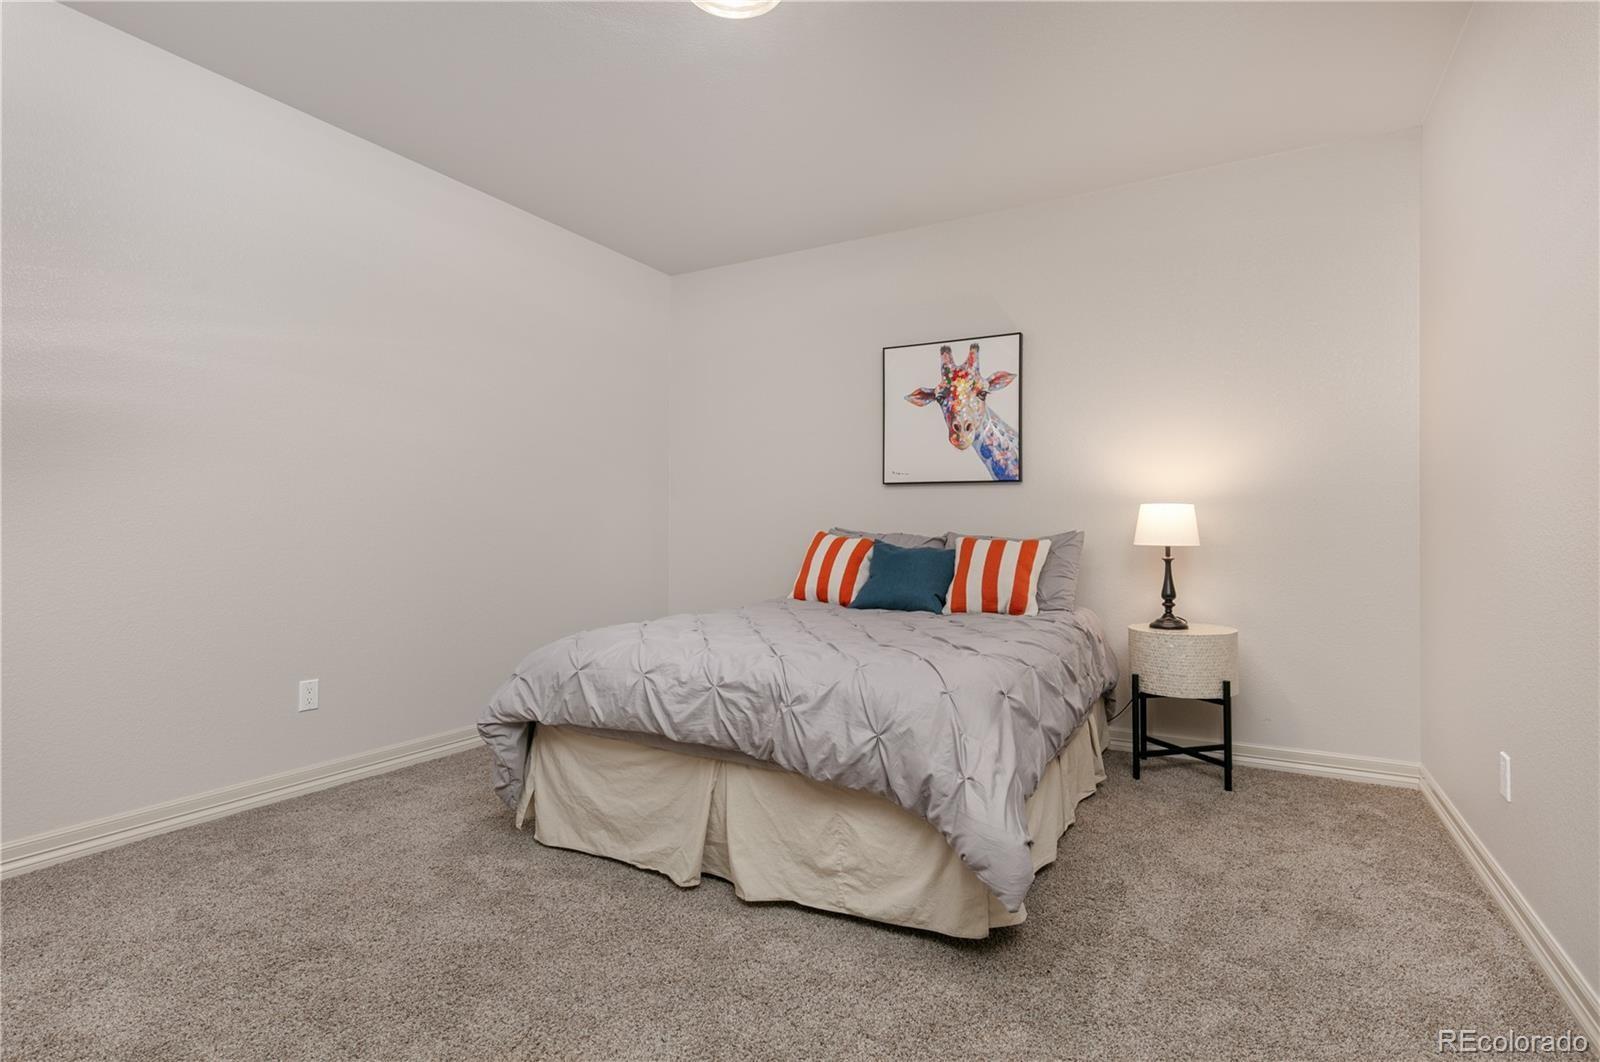 MLS# 9170952 - 29 - 1412 Onyx Circle, Longmont, CO 80504